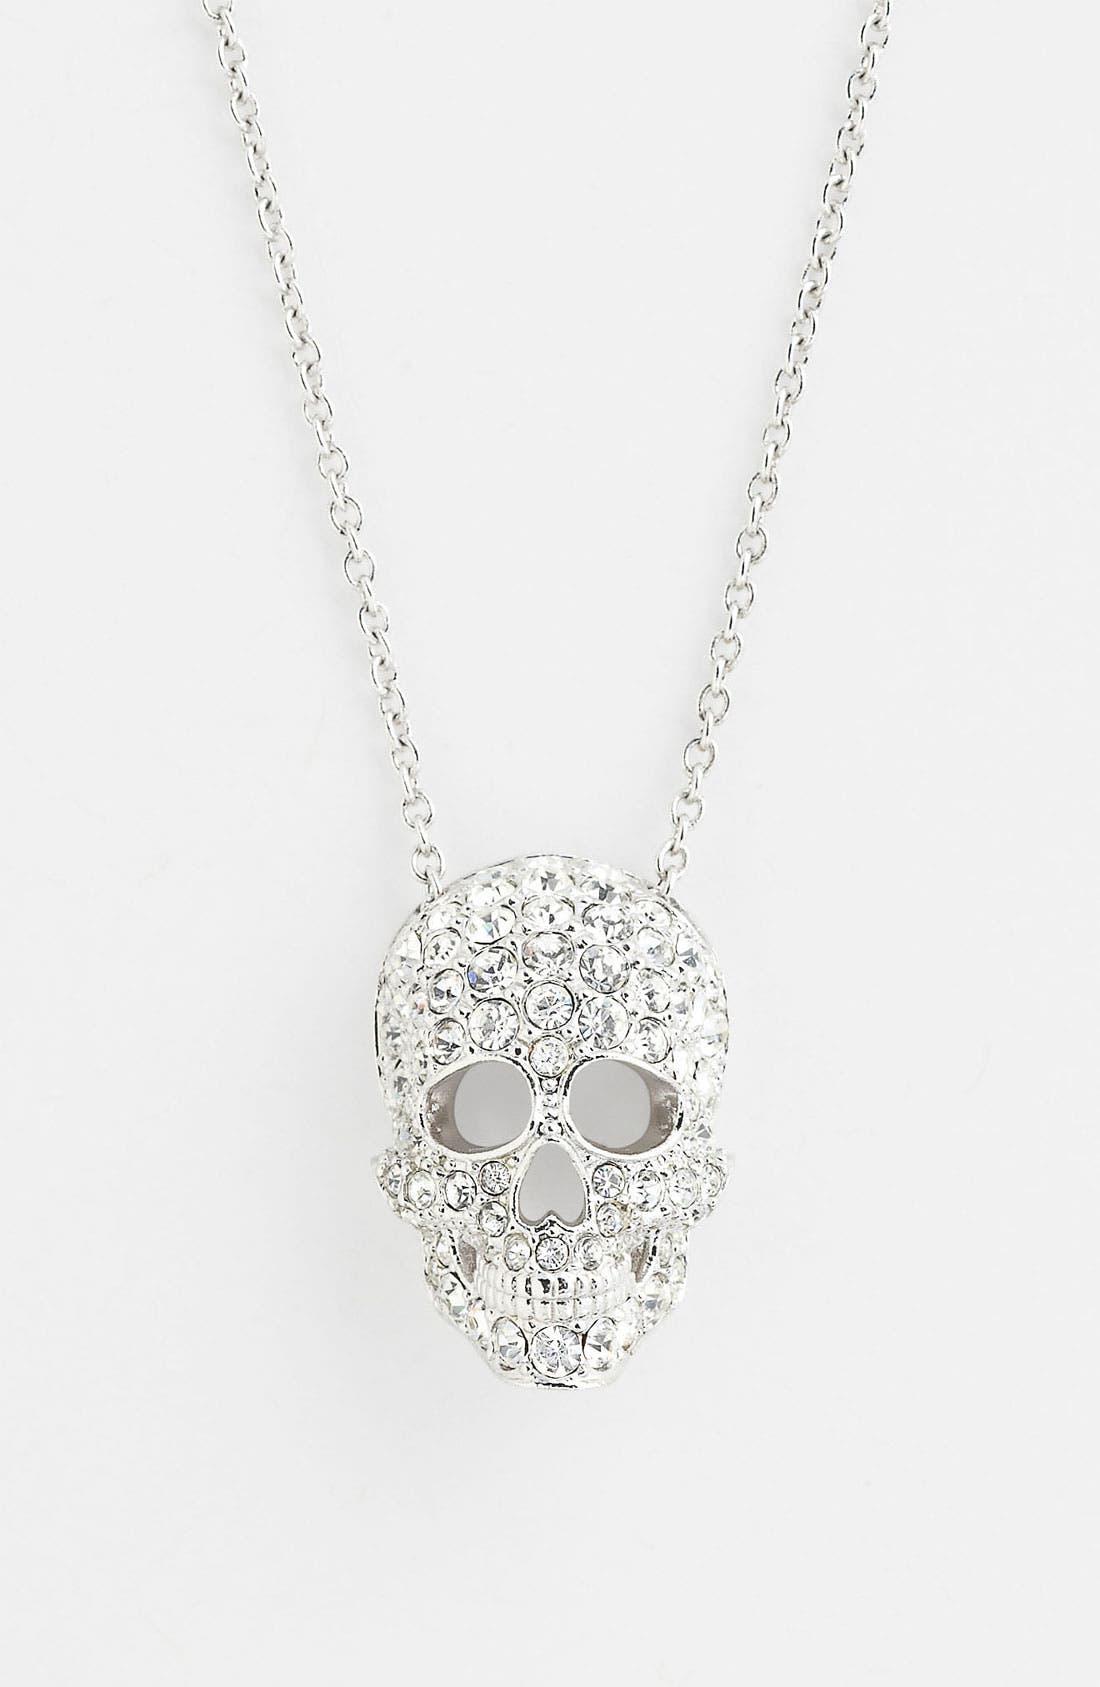 Alternate Image 1 Selected - Nadri 'Skull' Pendant Necklace (Nordstrom Exclusive)